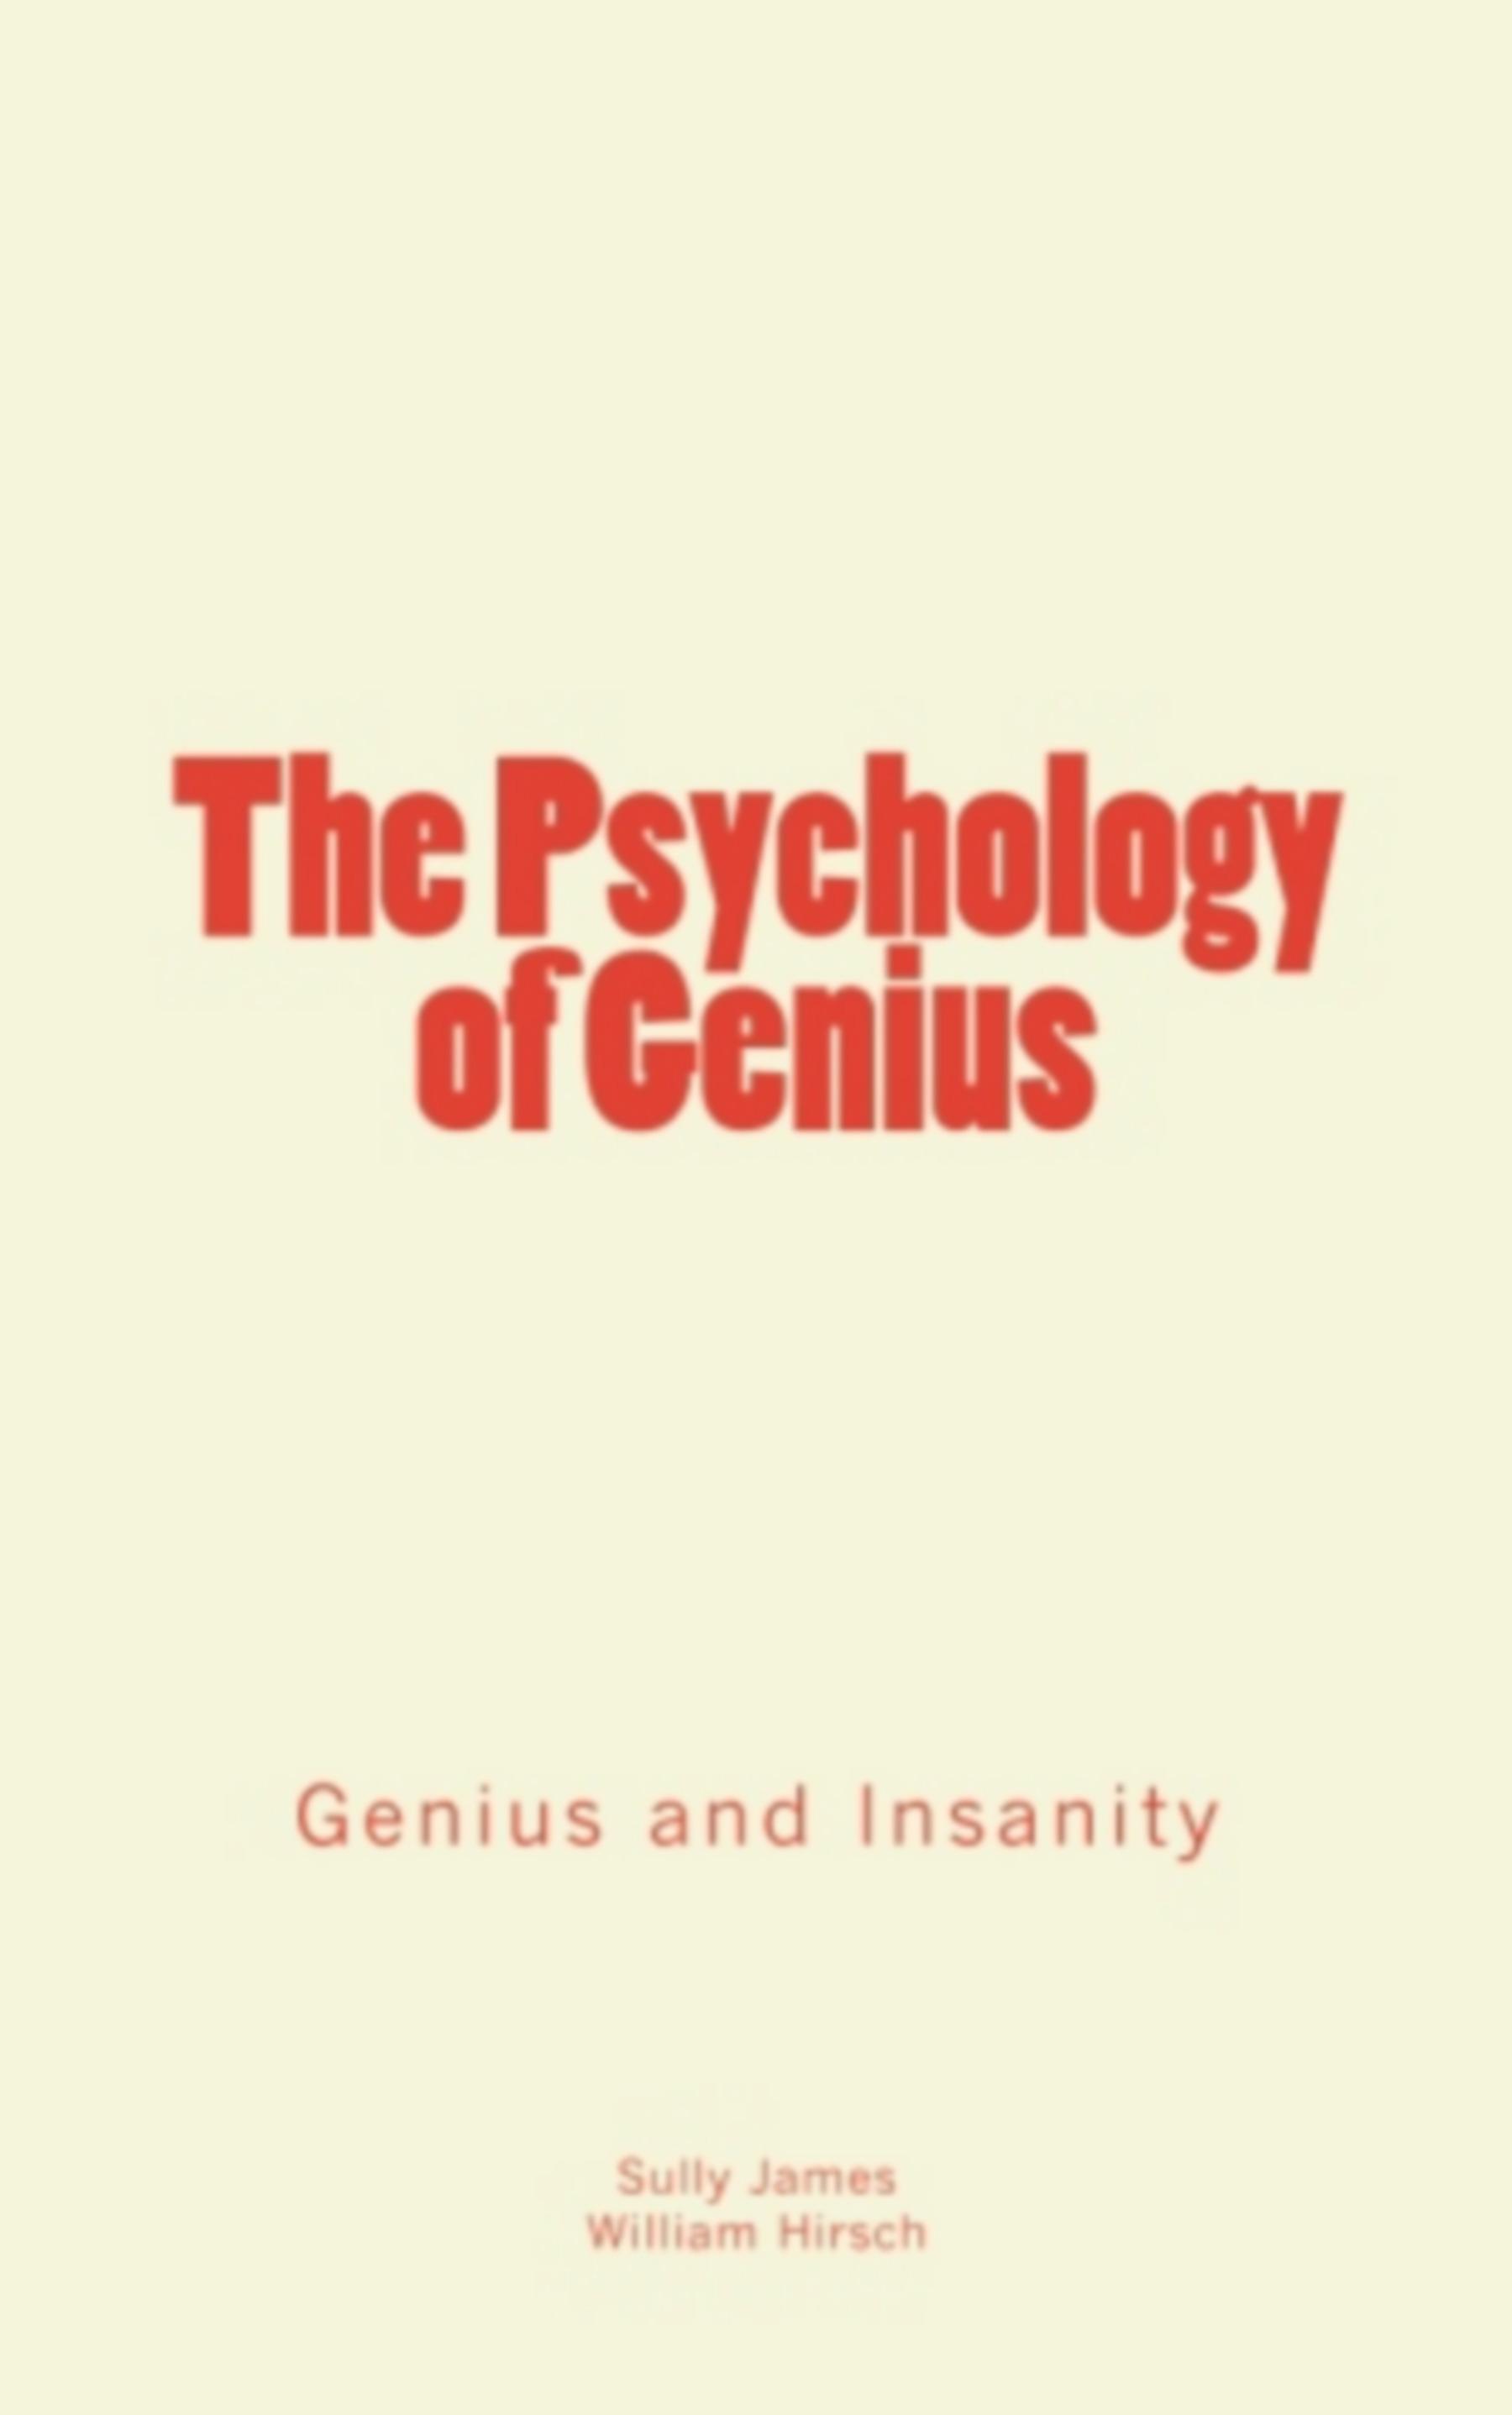 The Psychology of Genius